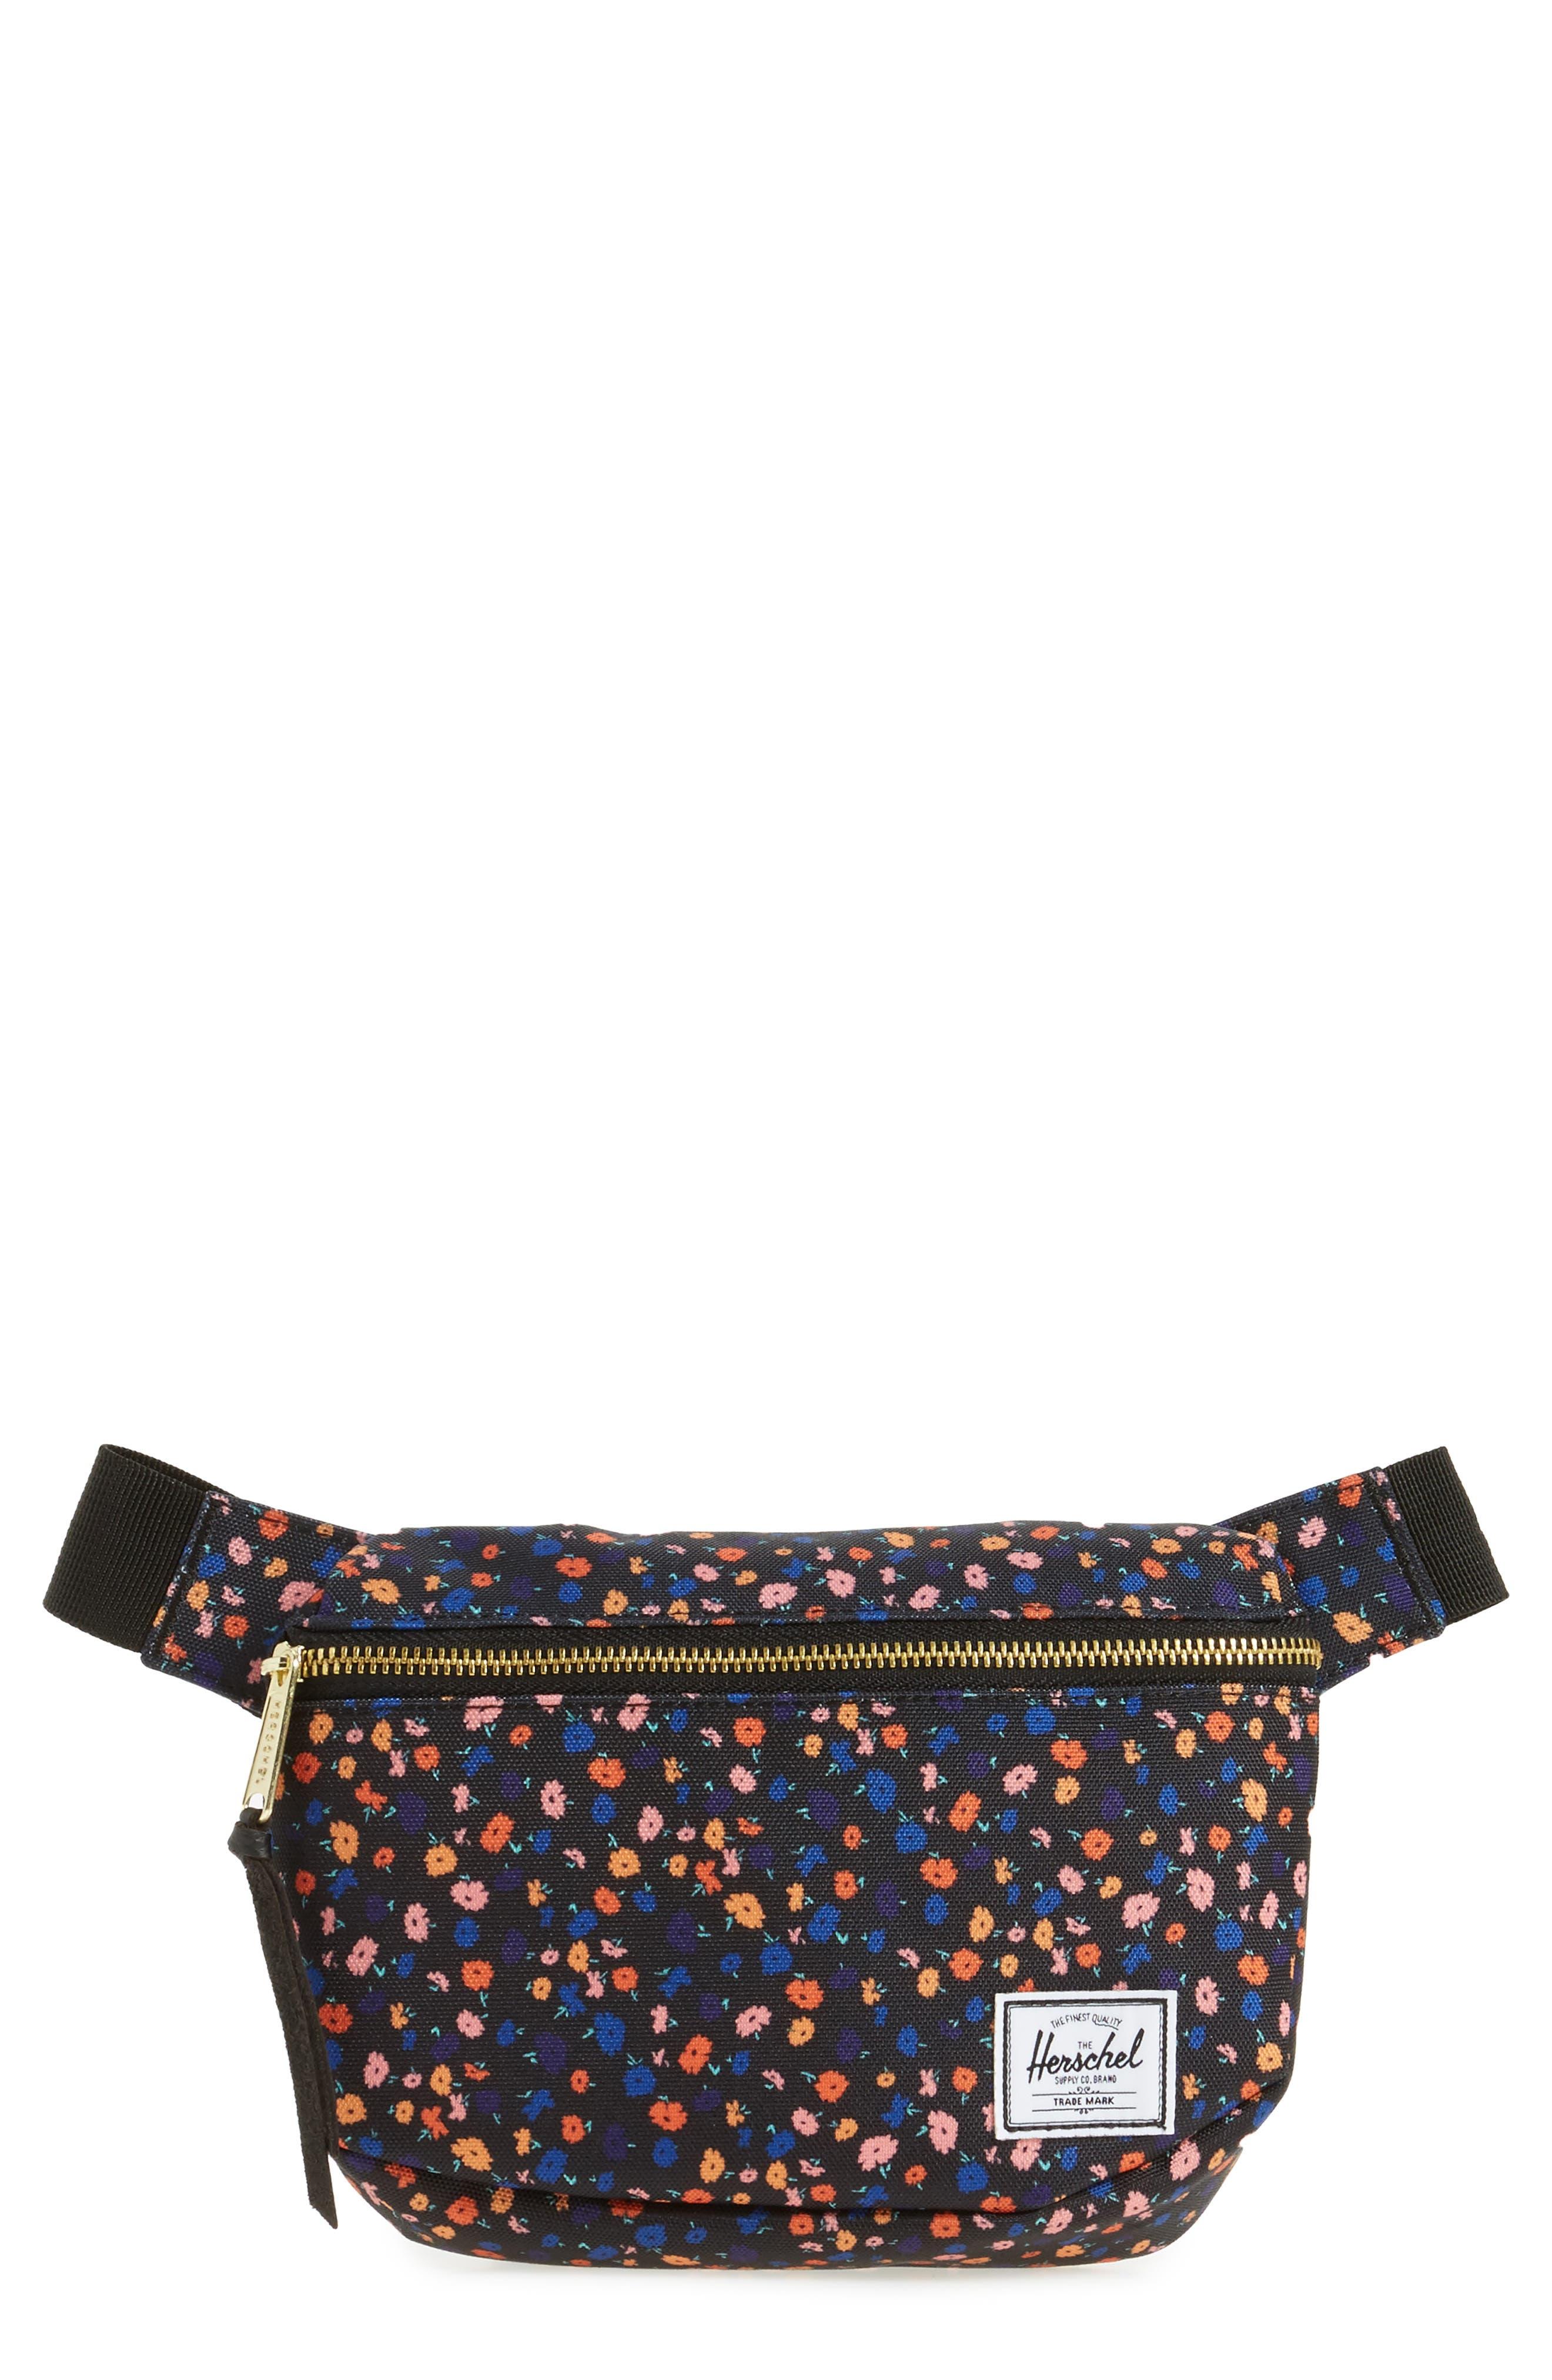 Fifteen Belt Bag,                             Main thumbnail 1, color,                             BLACK MINI FLORAL